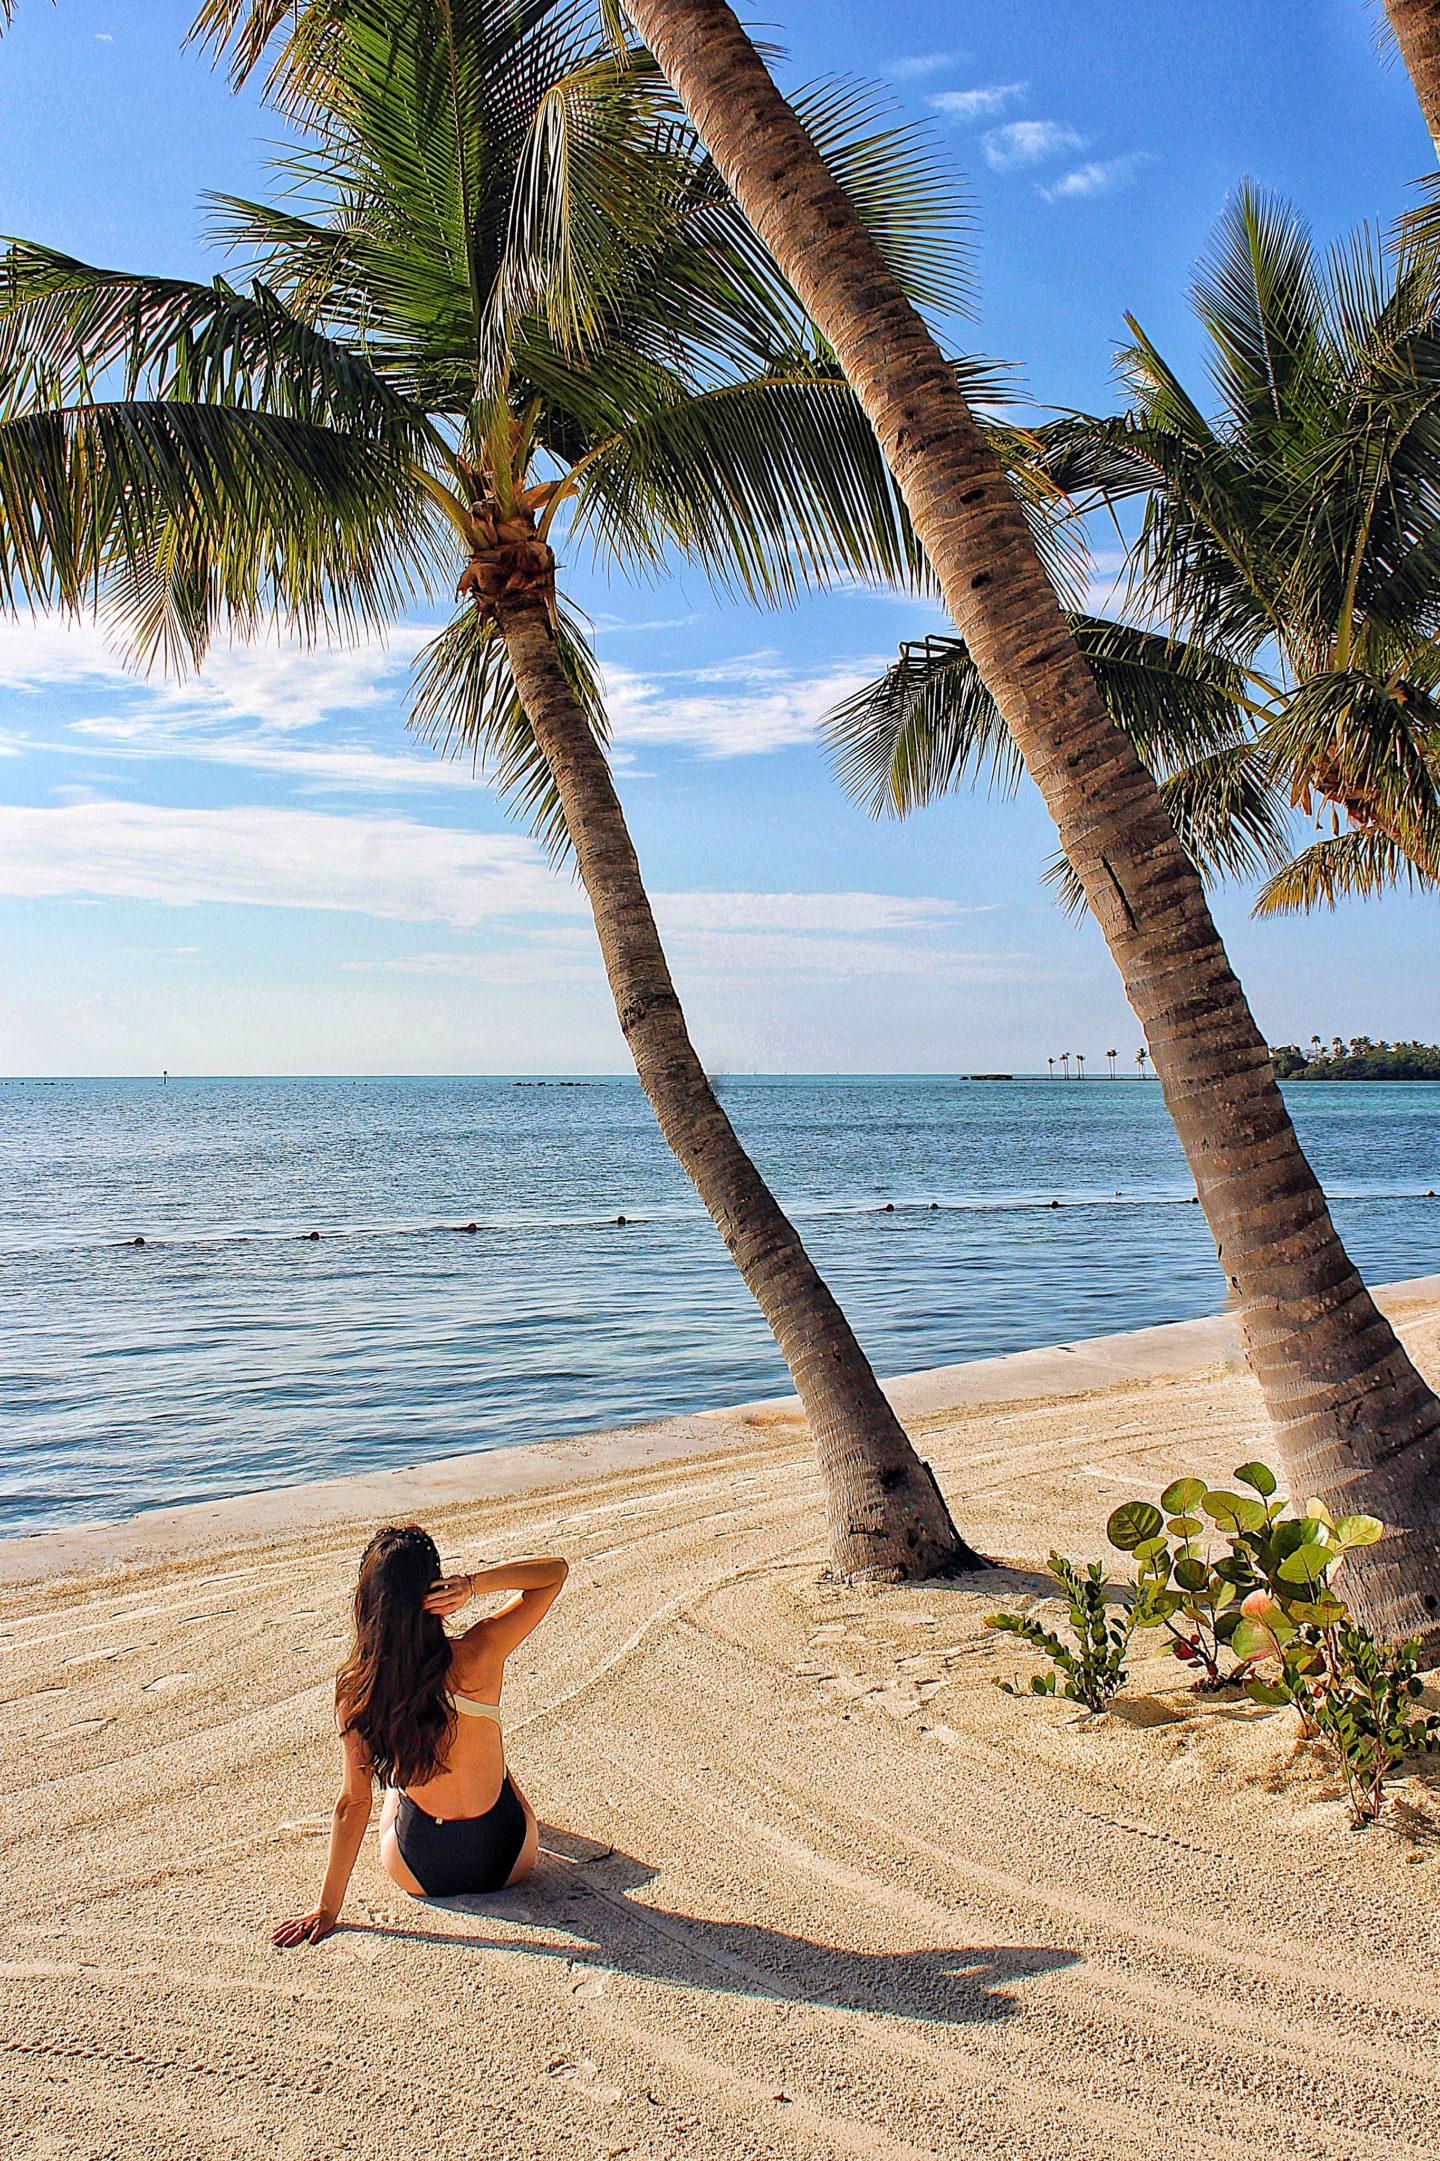 Escape-to-Amara-Cay-resort-Islamorada resort